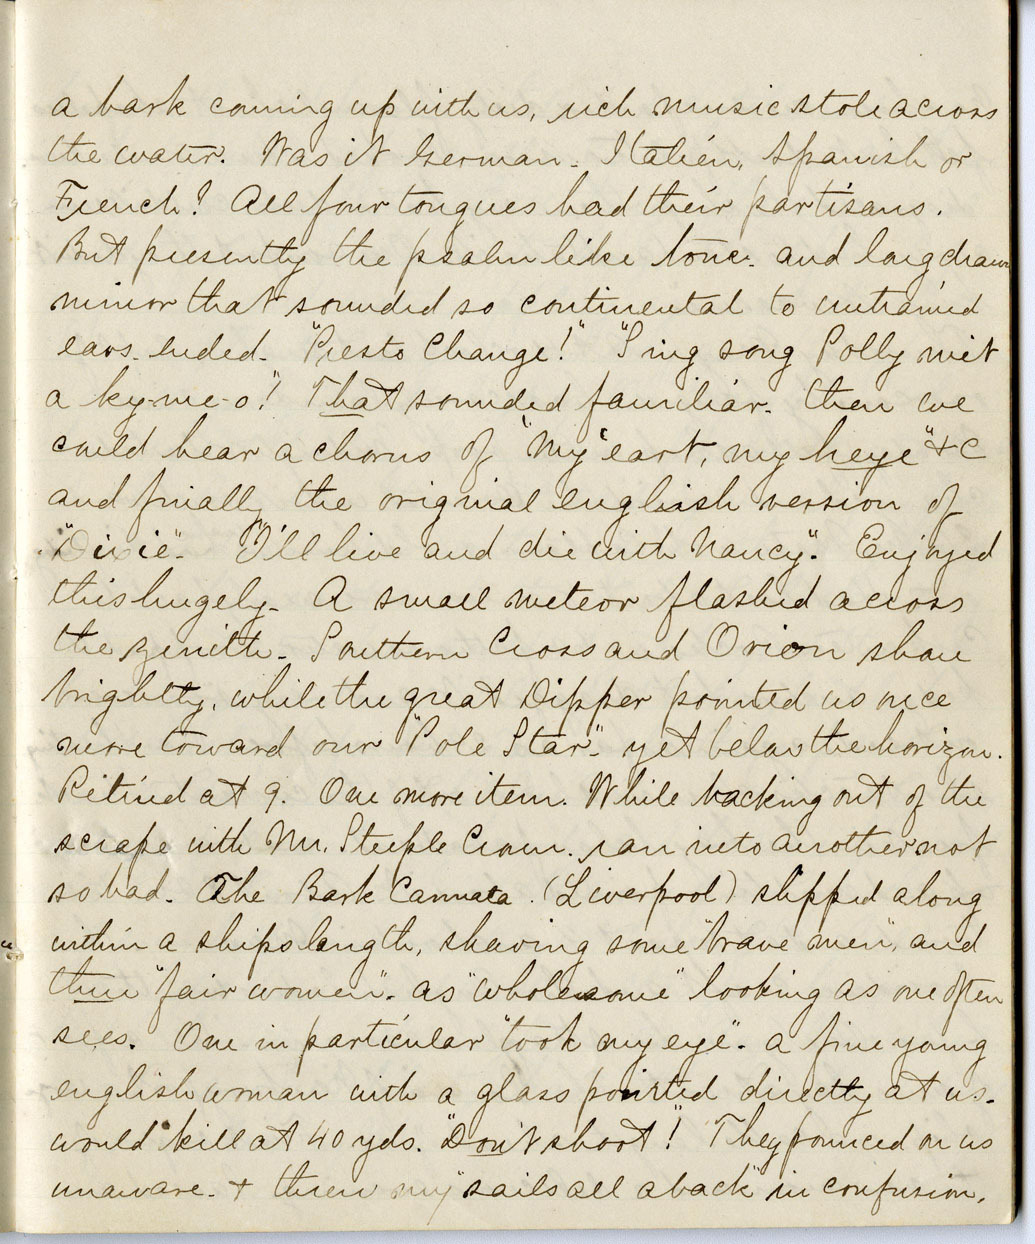 Cornelius Gold Journal, Page 22